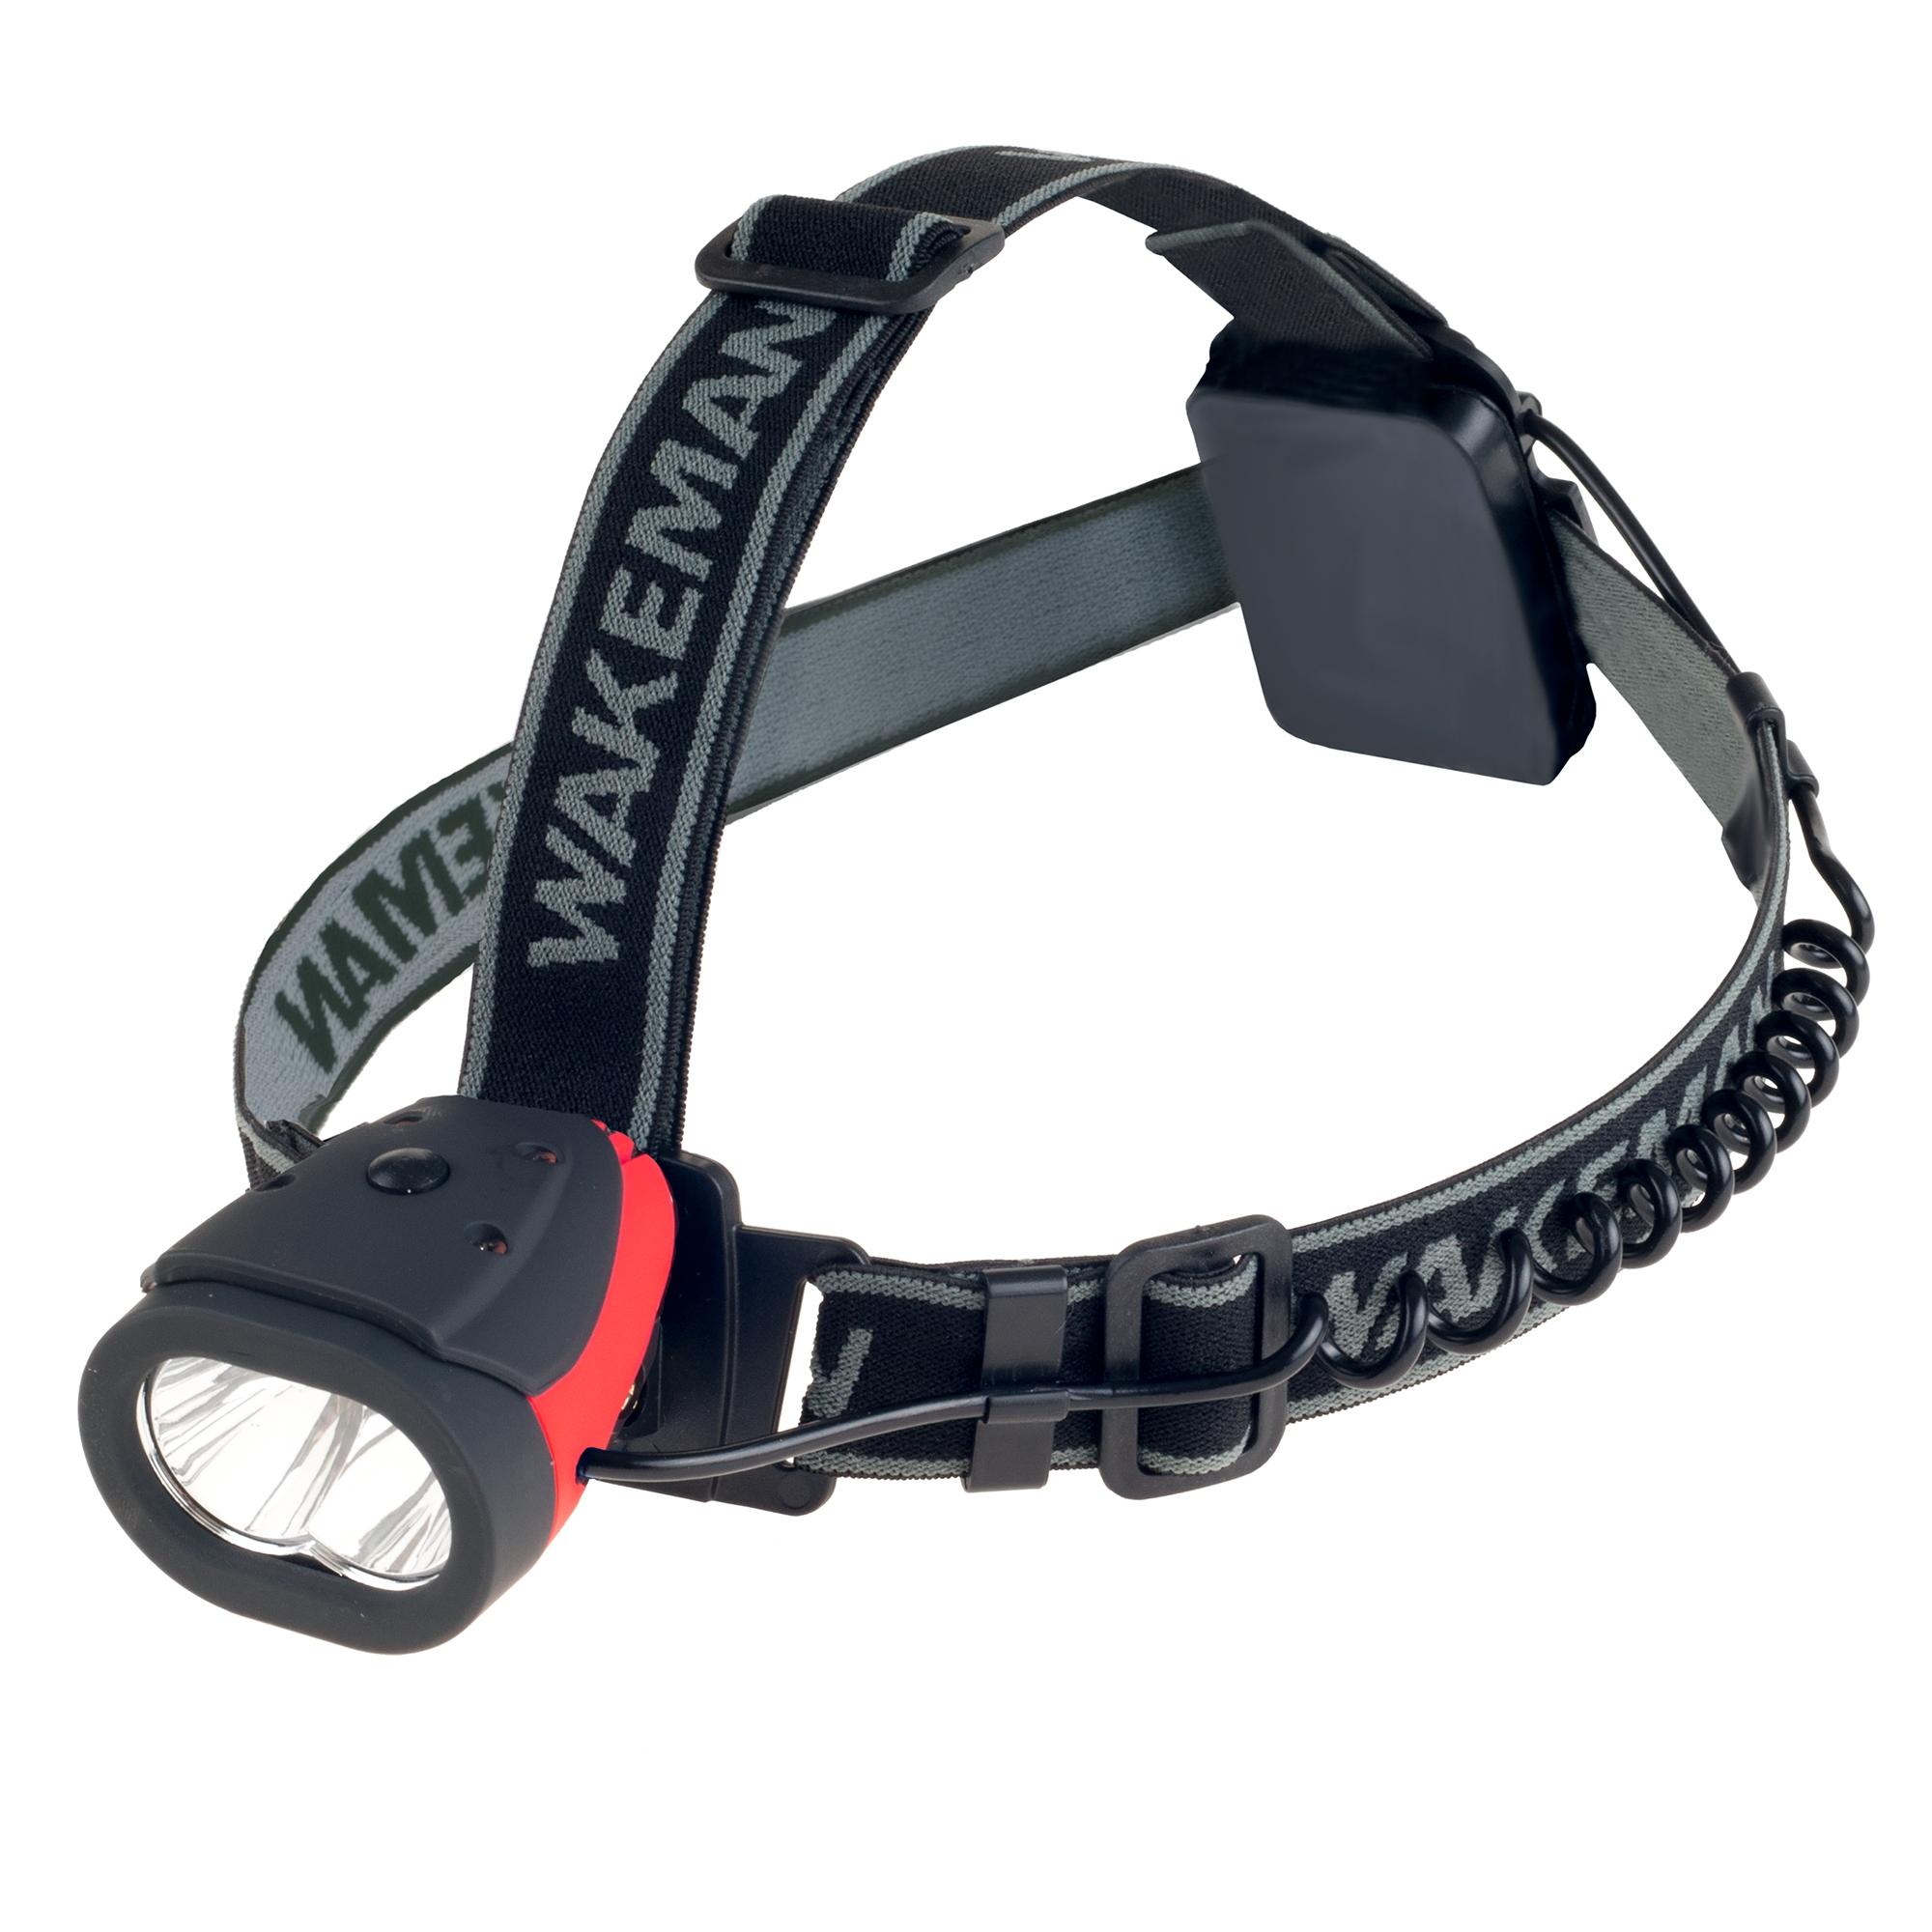 Water Resistant LED Headlamp- 160 Lumen